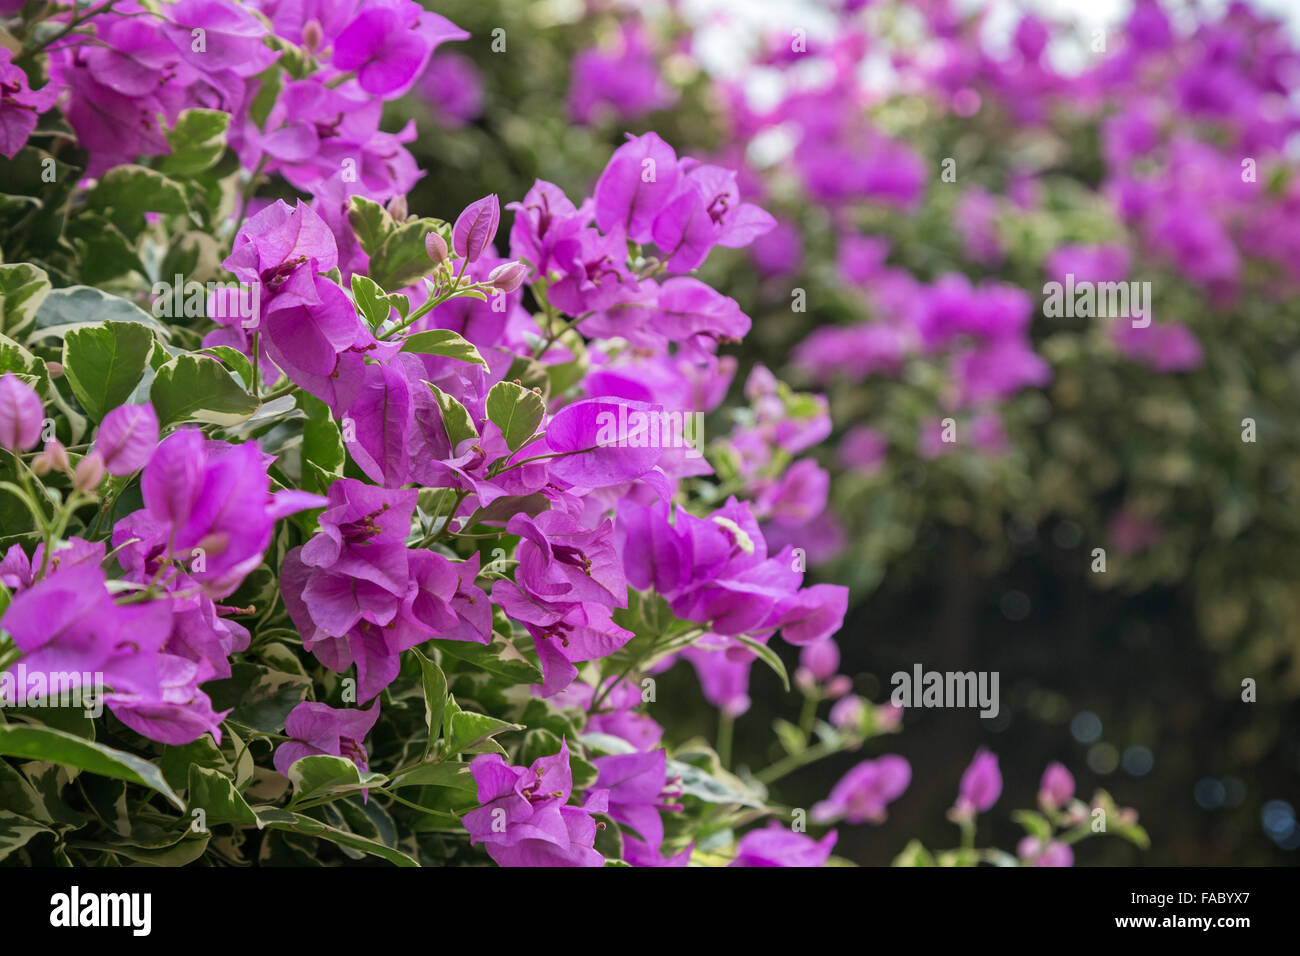 violet flowers bougainvillea stockfotos violet flowers. Black Bedroom Furniture Sets. Home Design Ideas